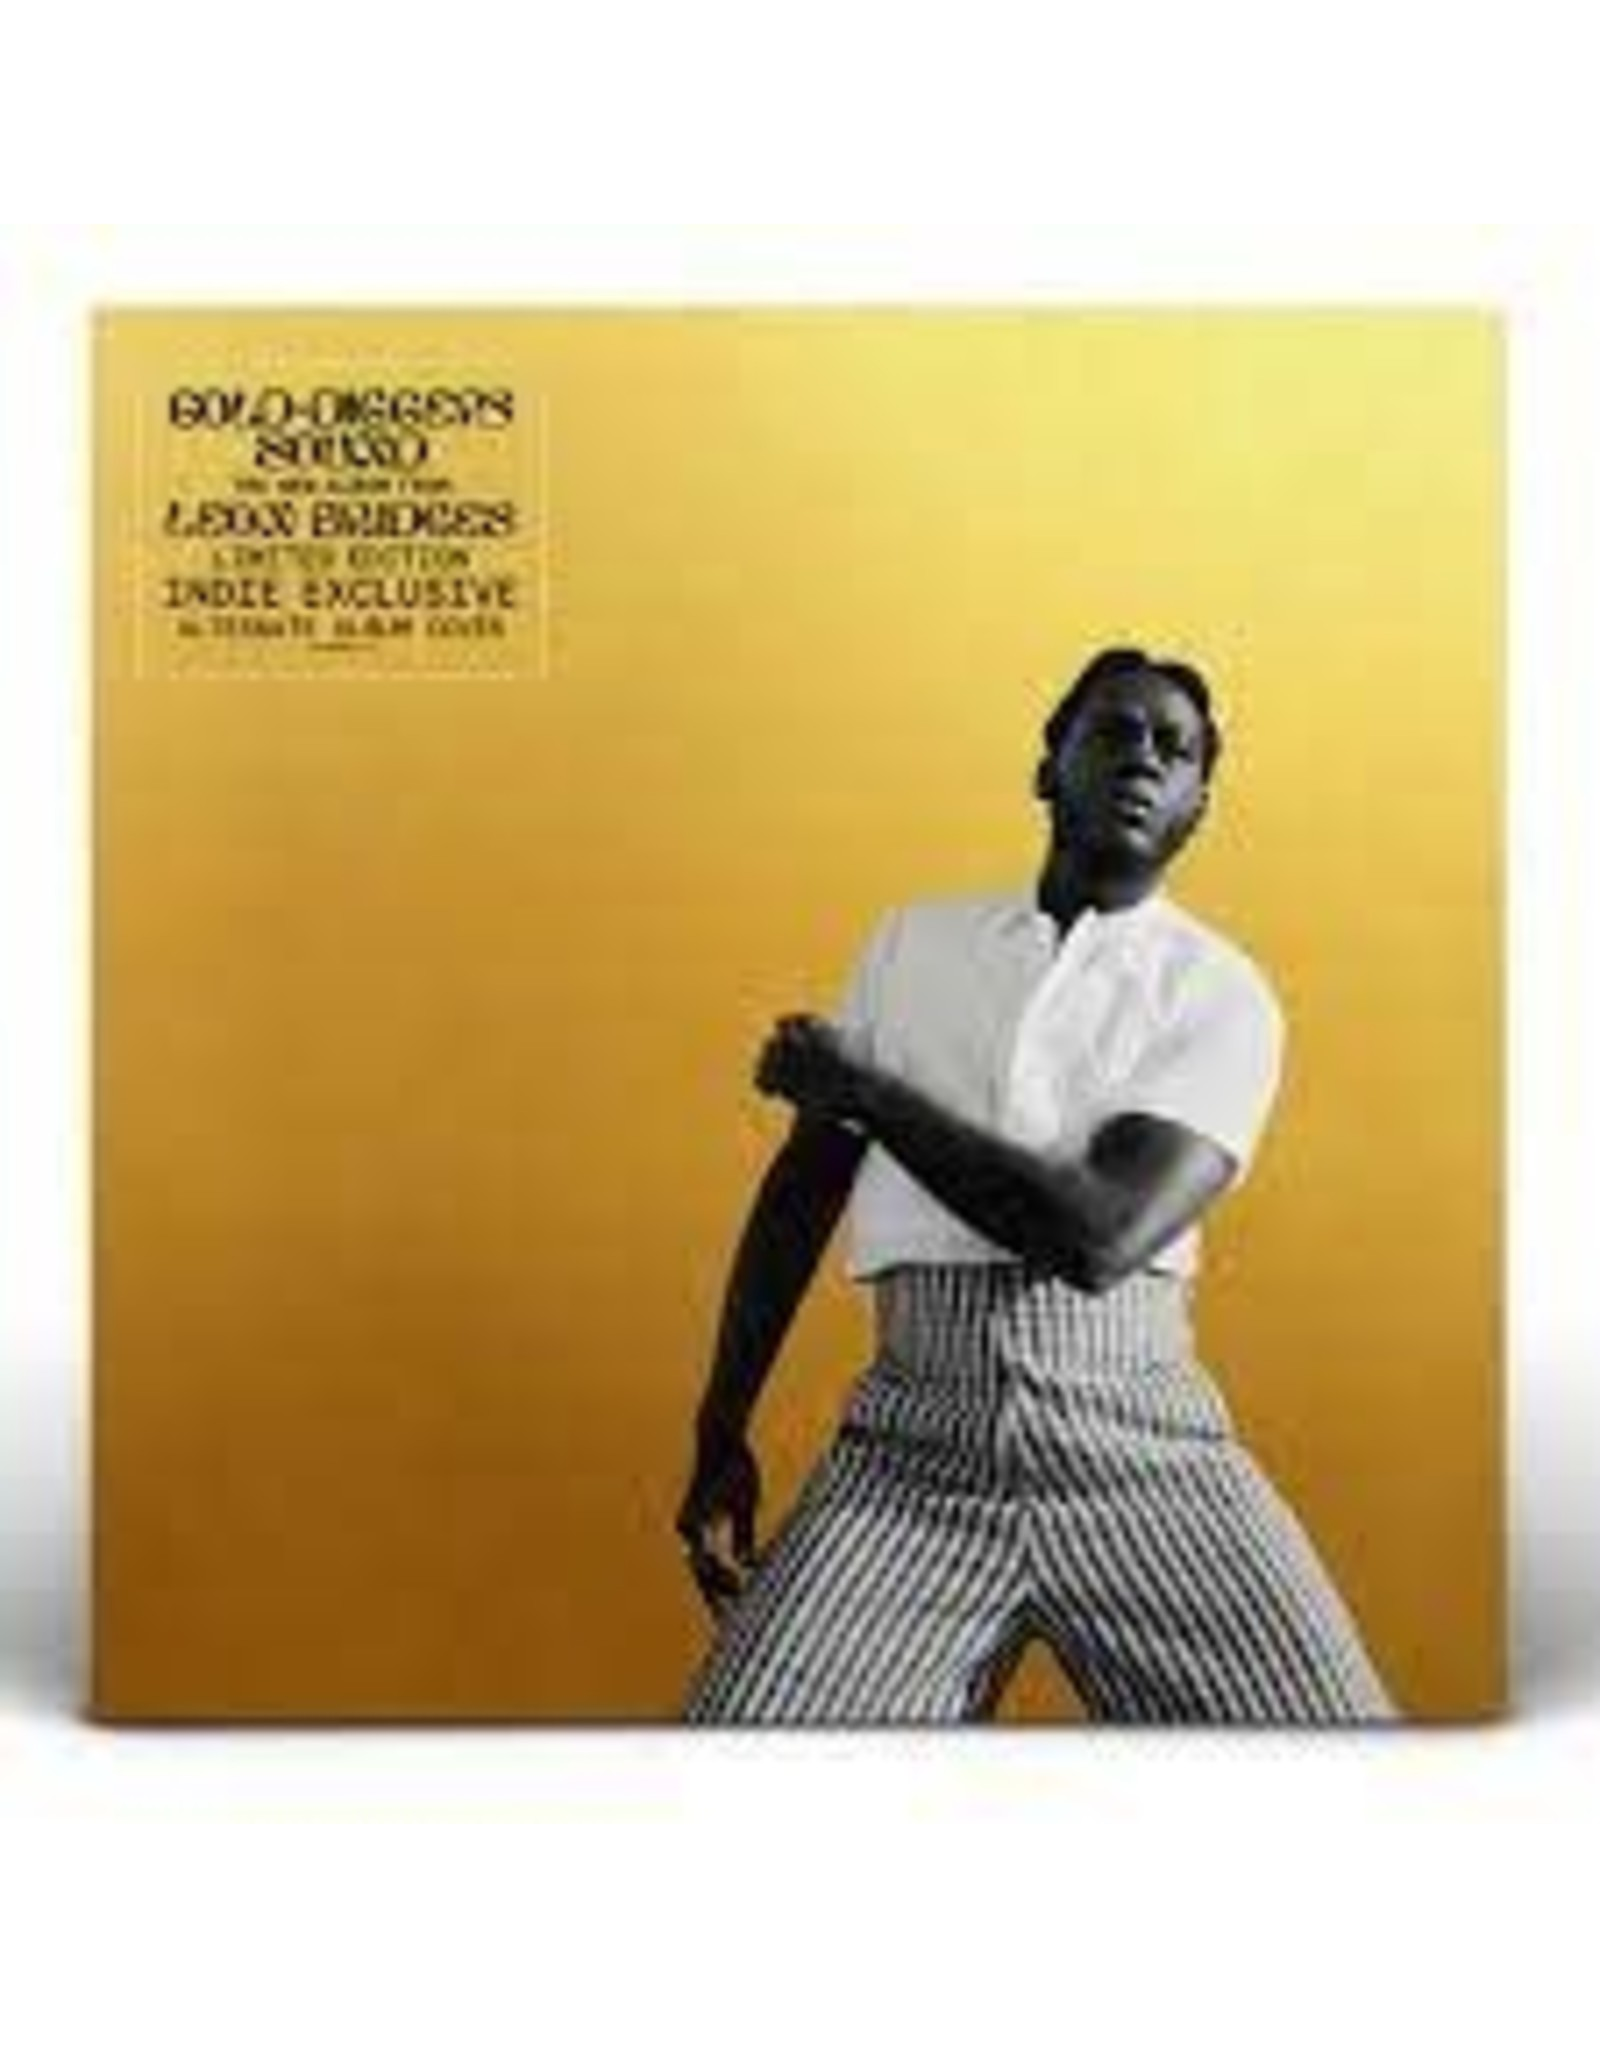 Columbia Bridges, Leon: Gold-Diggers Sound LP